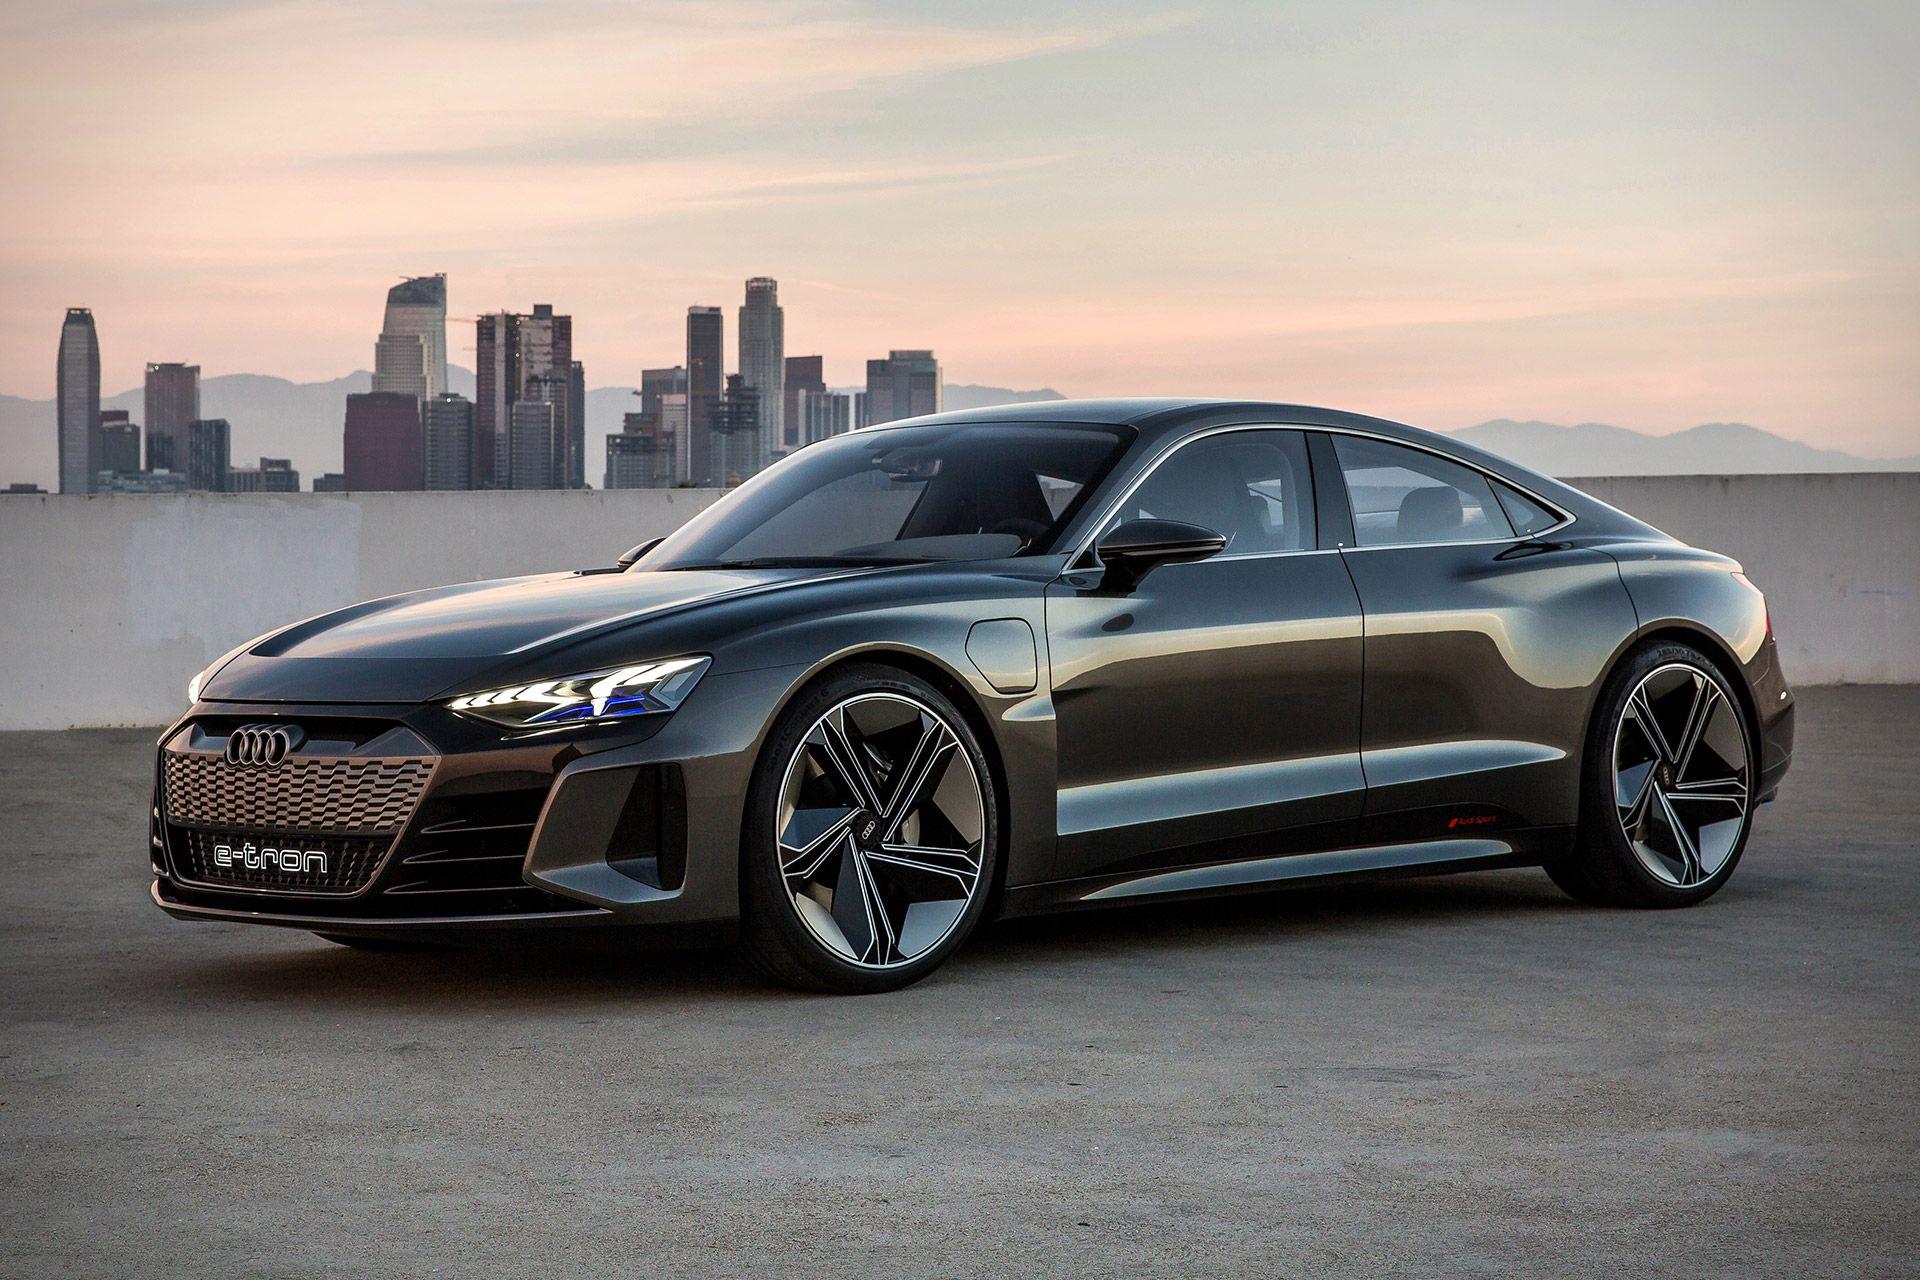 Audi E Tron Gt Concept Audi E Tron Audi Gt E Tron